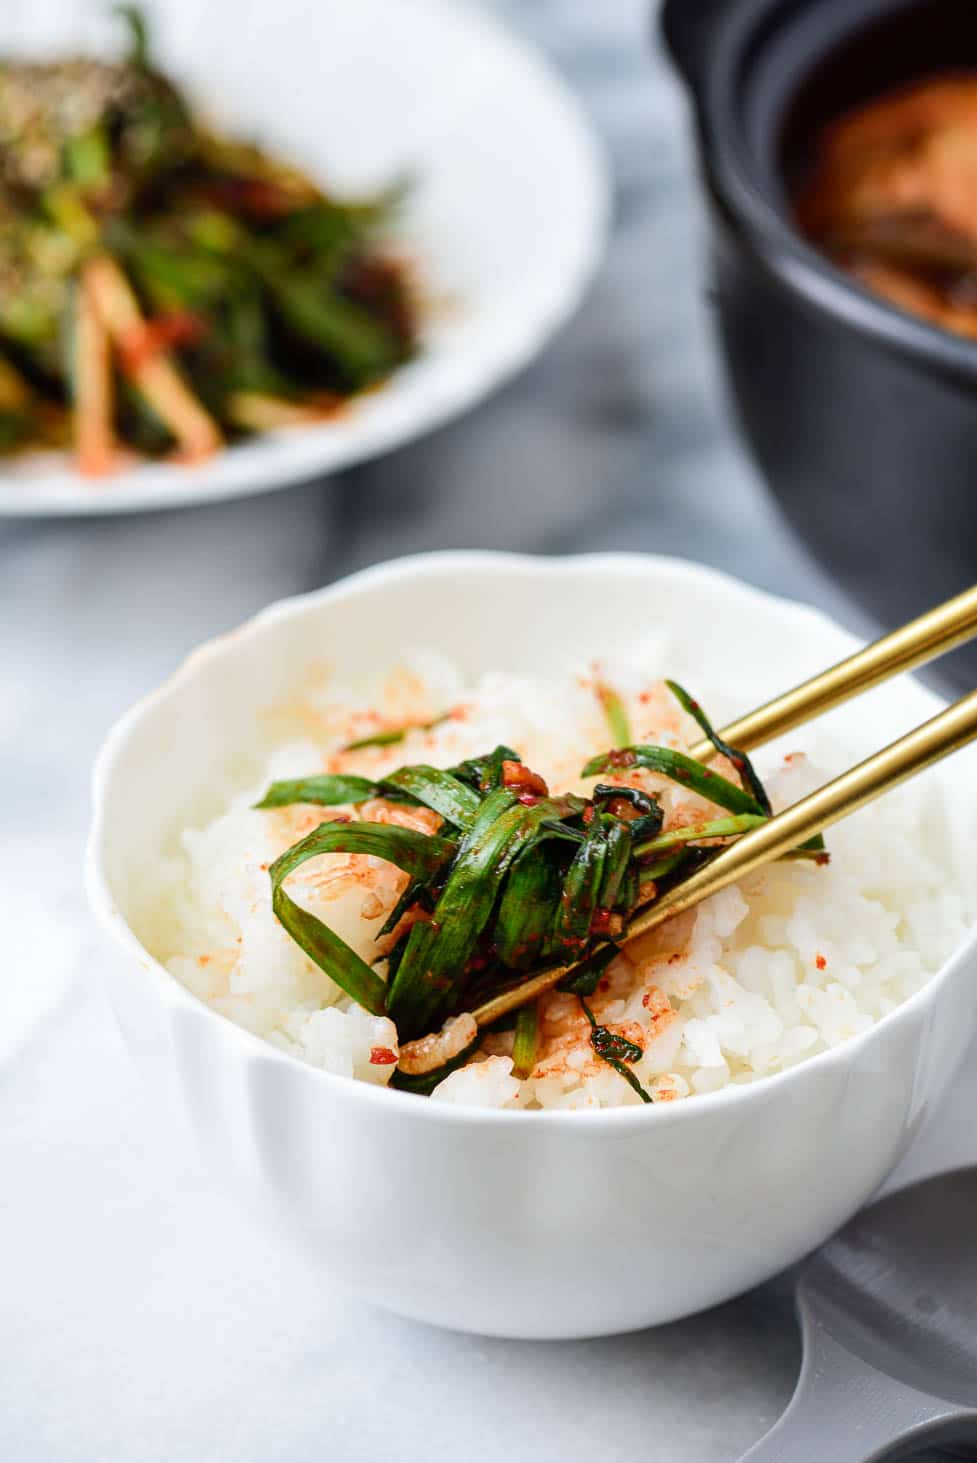 DSC7311 01 3 - Buchu Kimchi (Garlic Chives Kimchi)